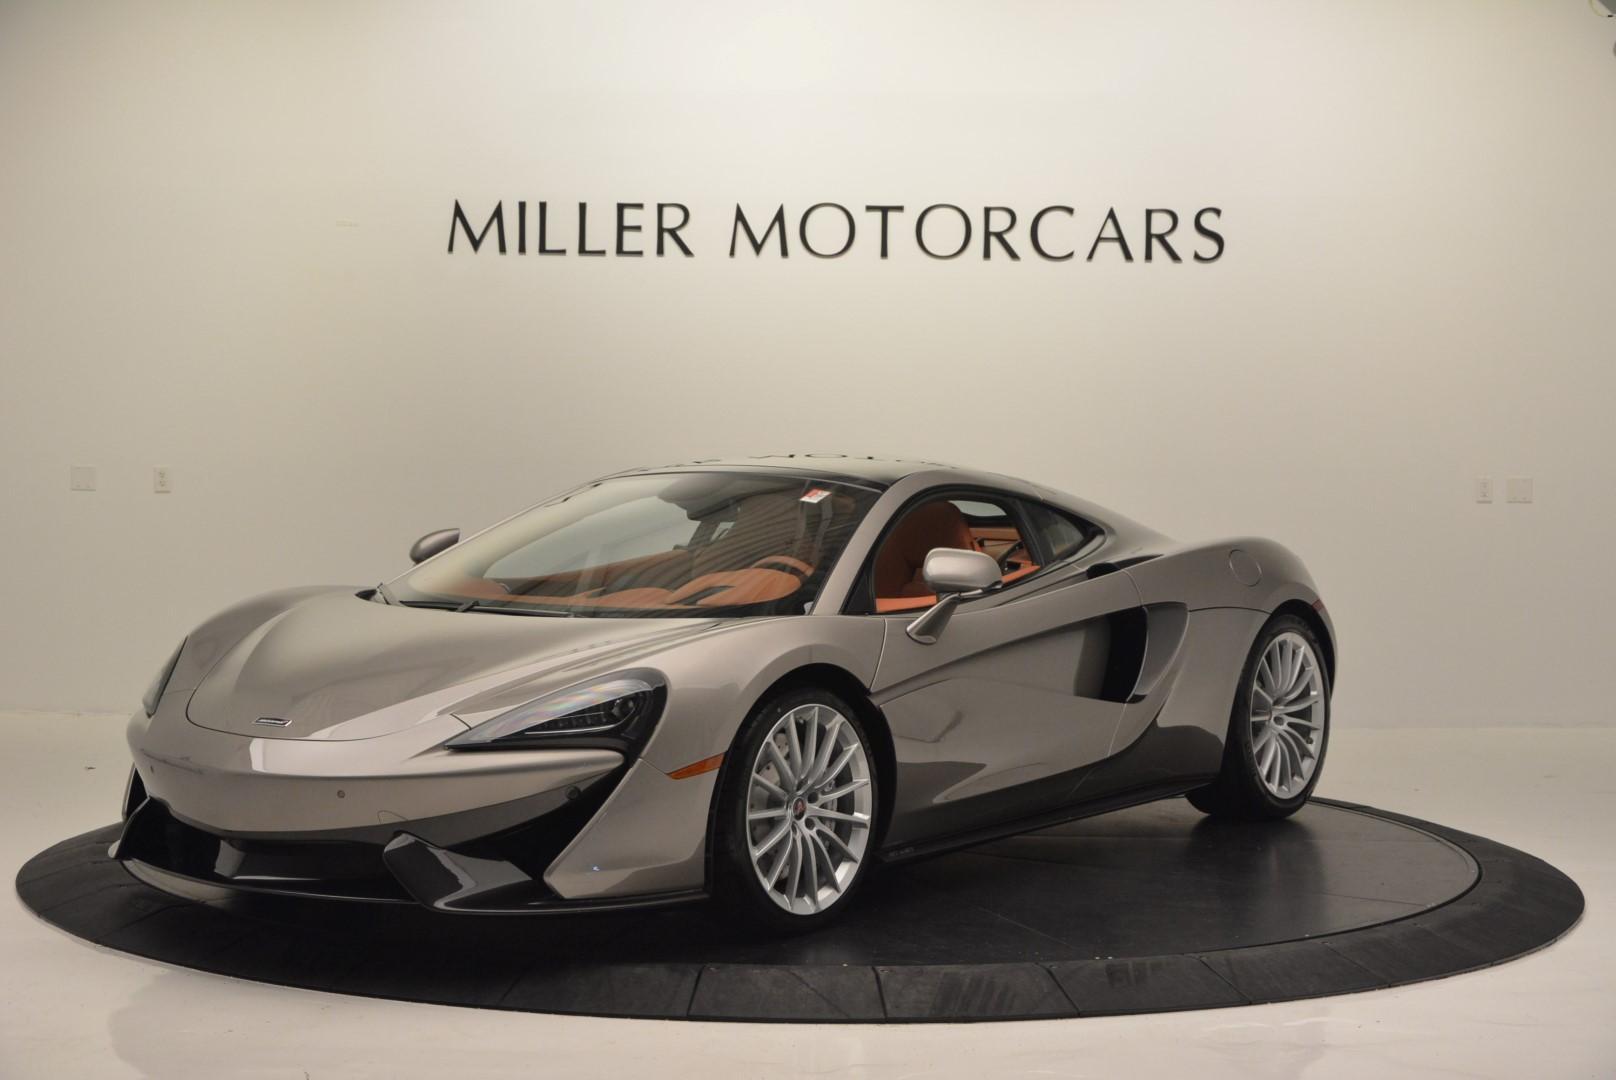 https://www.millermotorcars.com/galleria_images/515/515_main_l.jpg